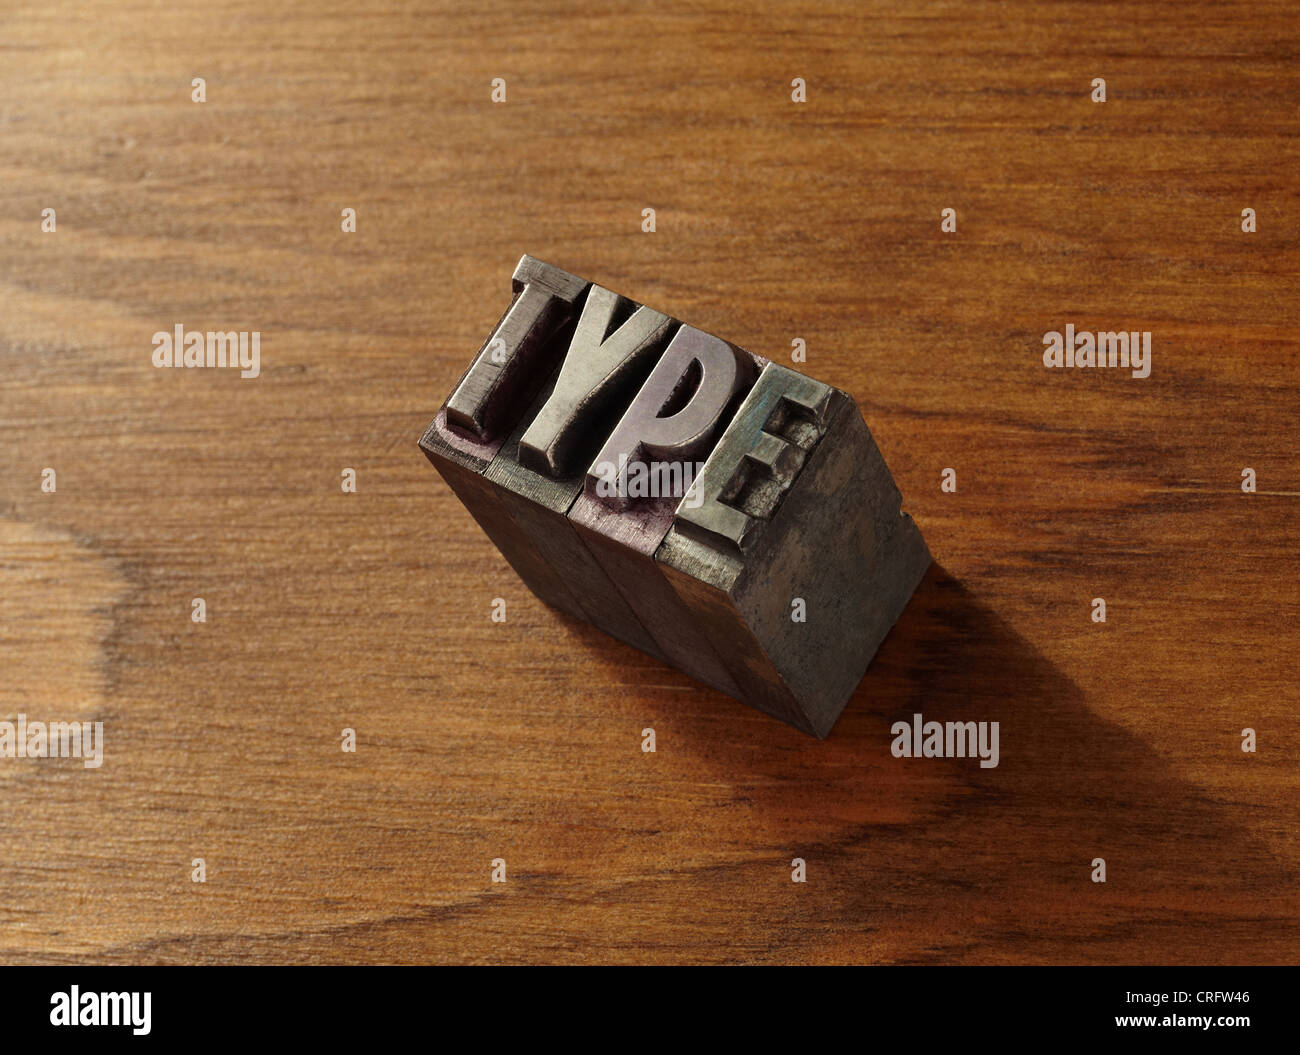 Lead type spelling 'type' - Stock Image